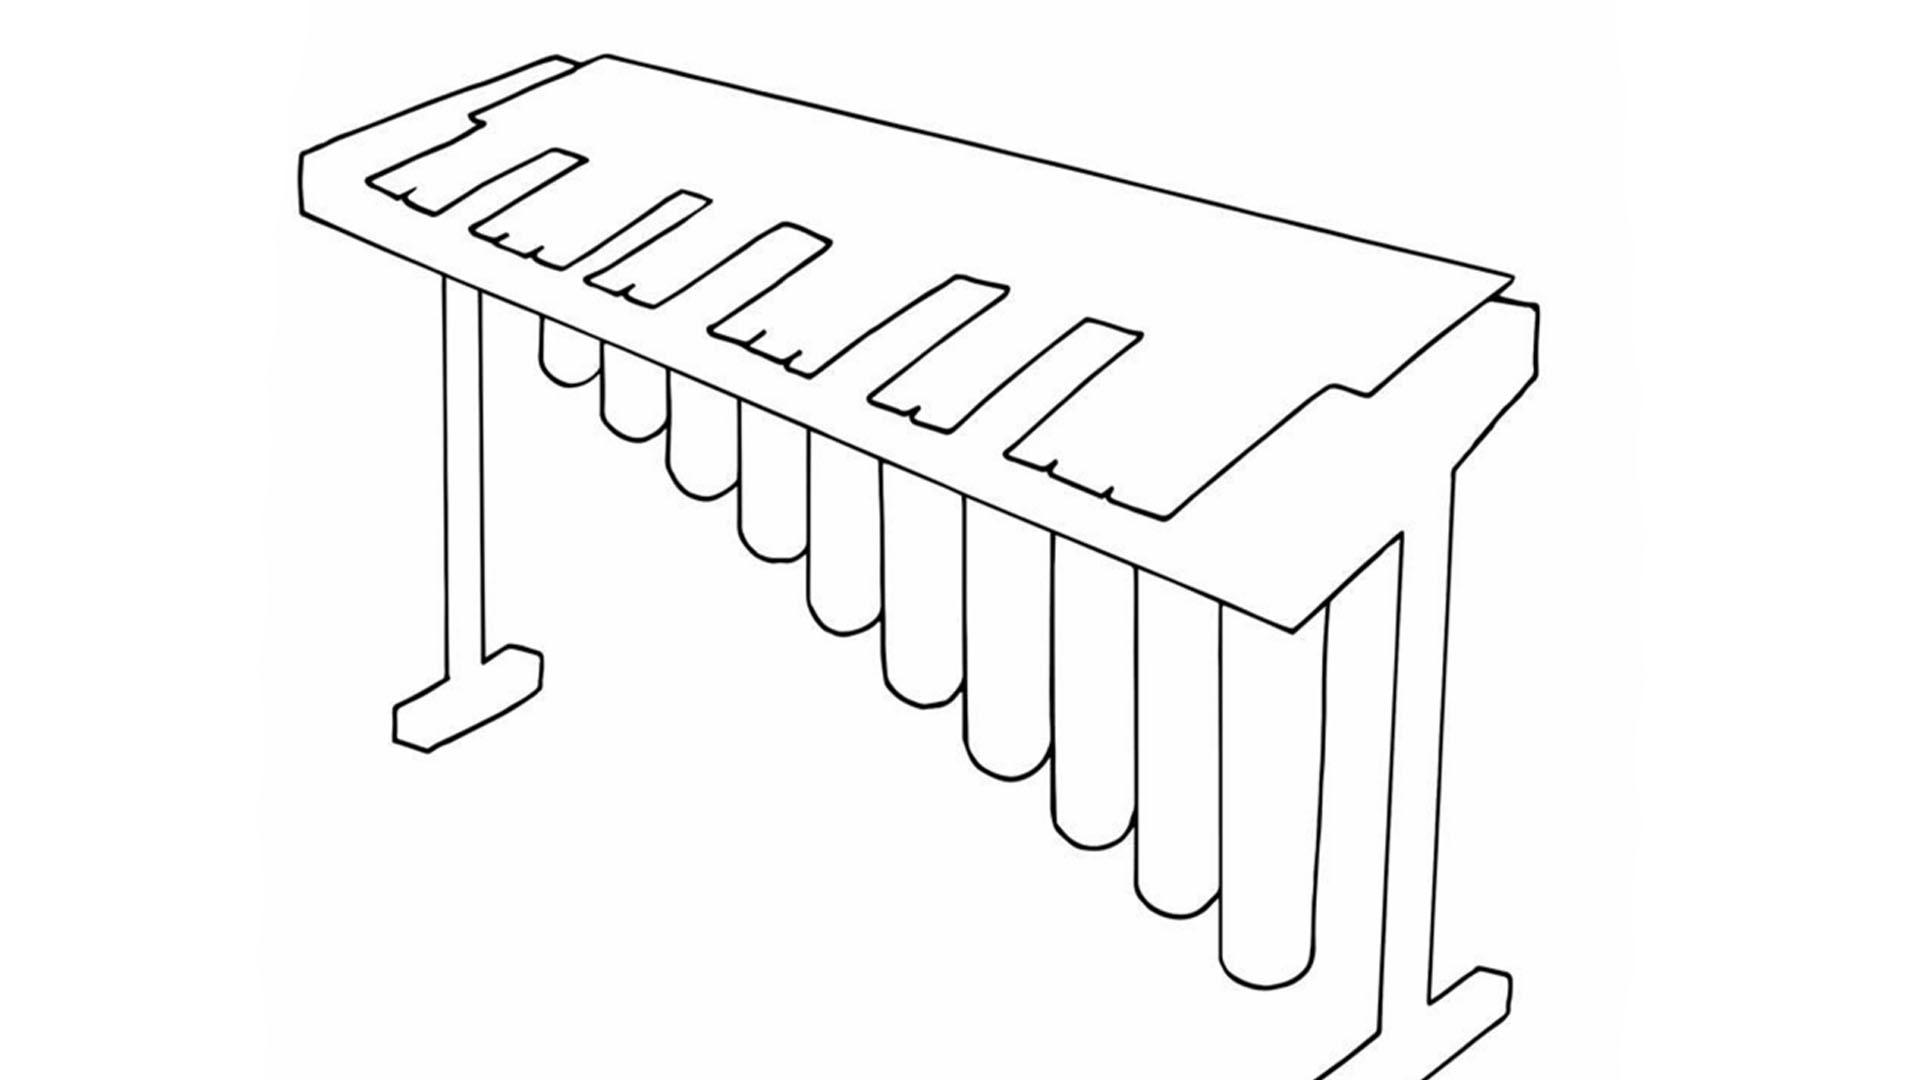 Diythumb vibraphone